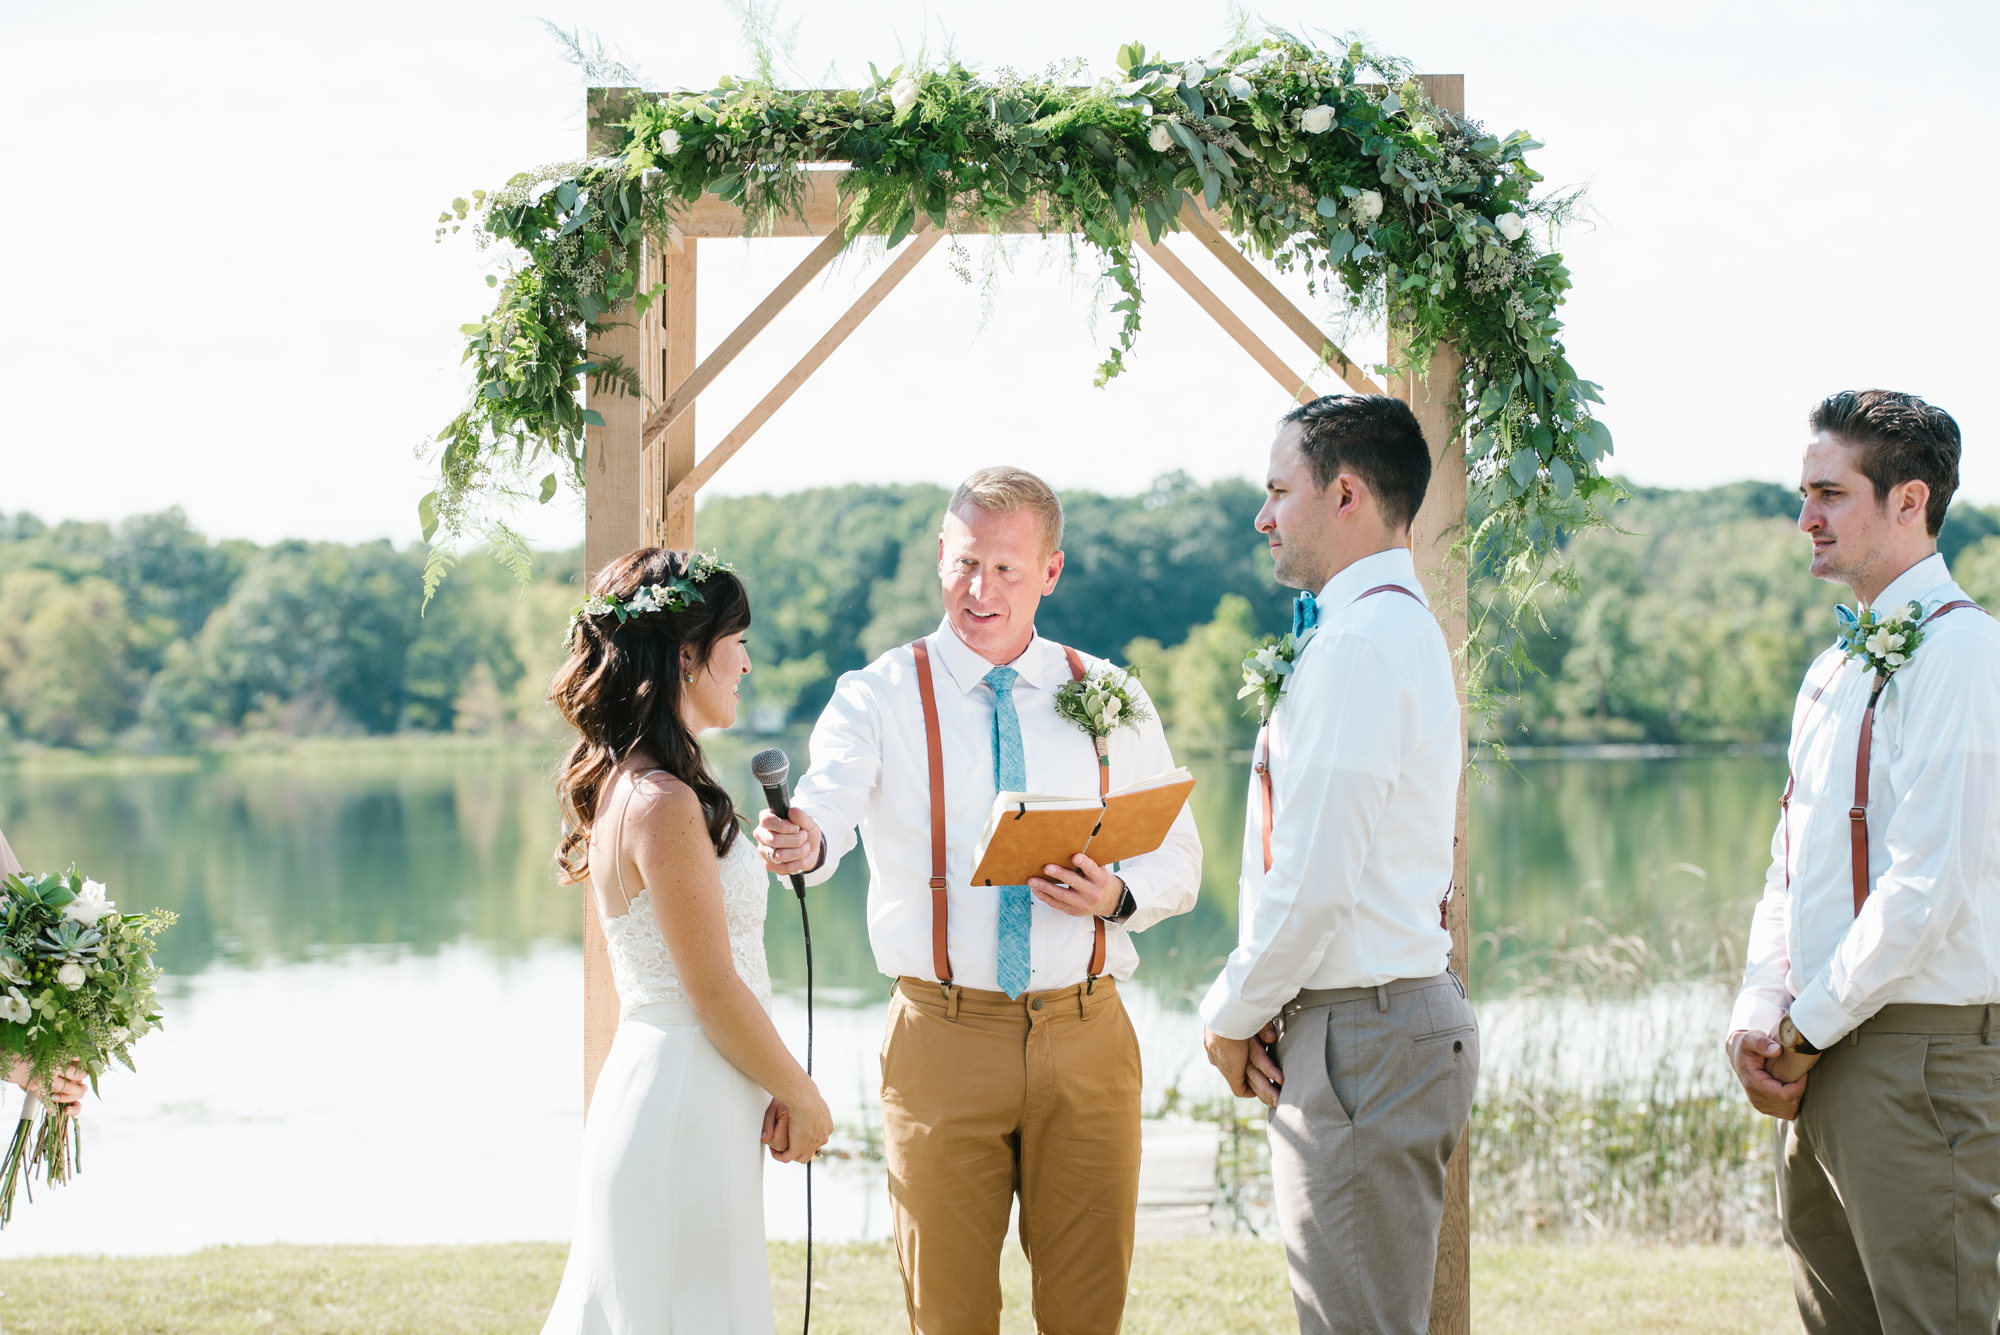 Quincy-Coldwater-Michigan-farm-wedding-photogapher-sydney-marie (149).jpg